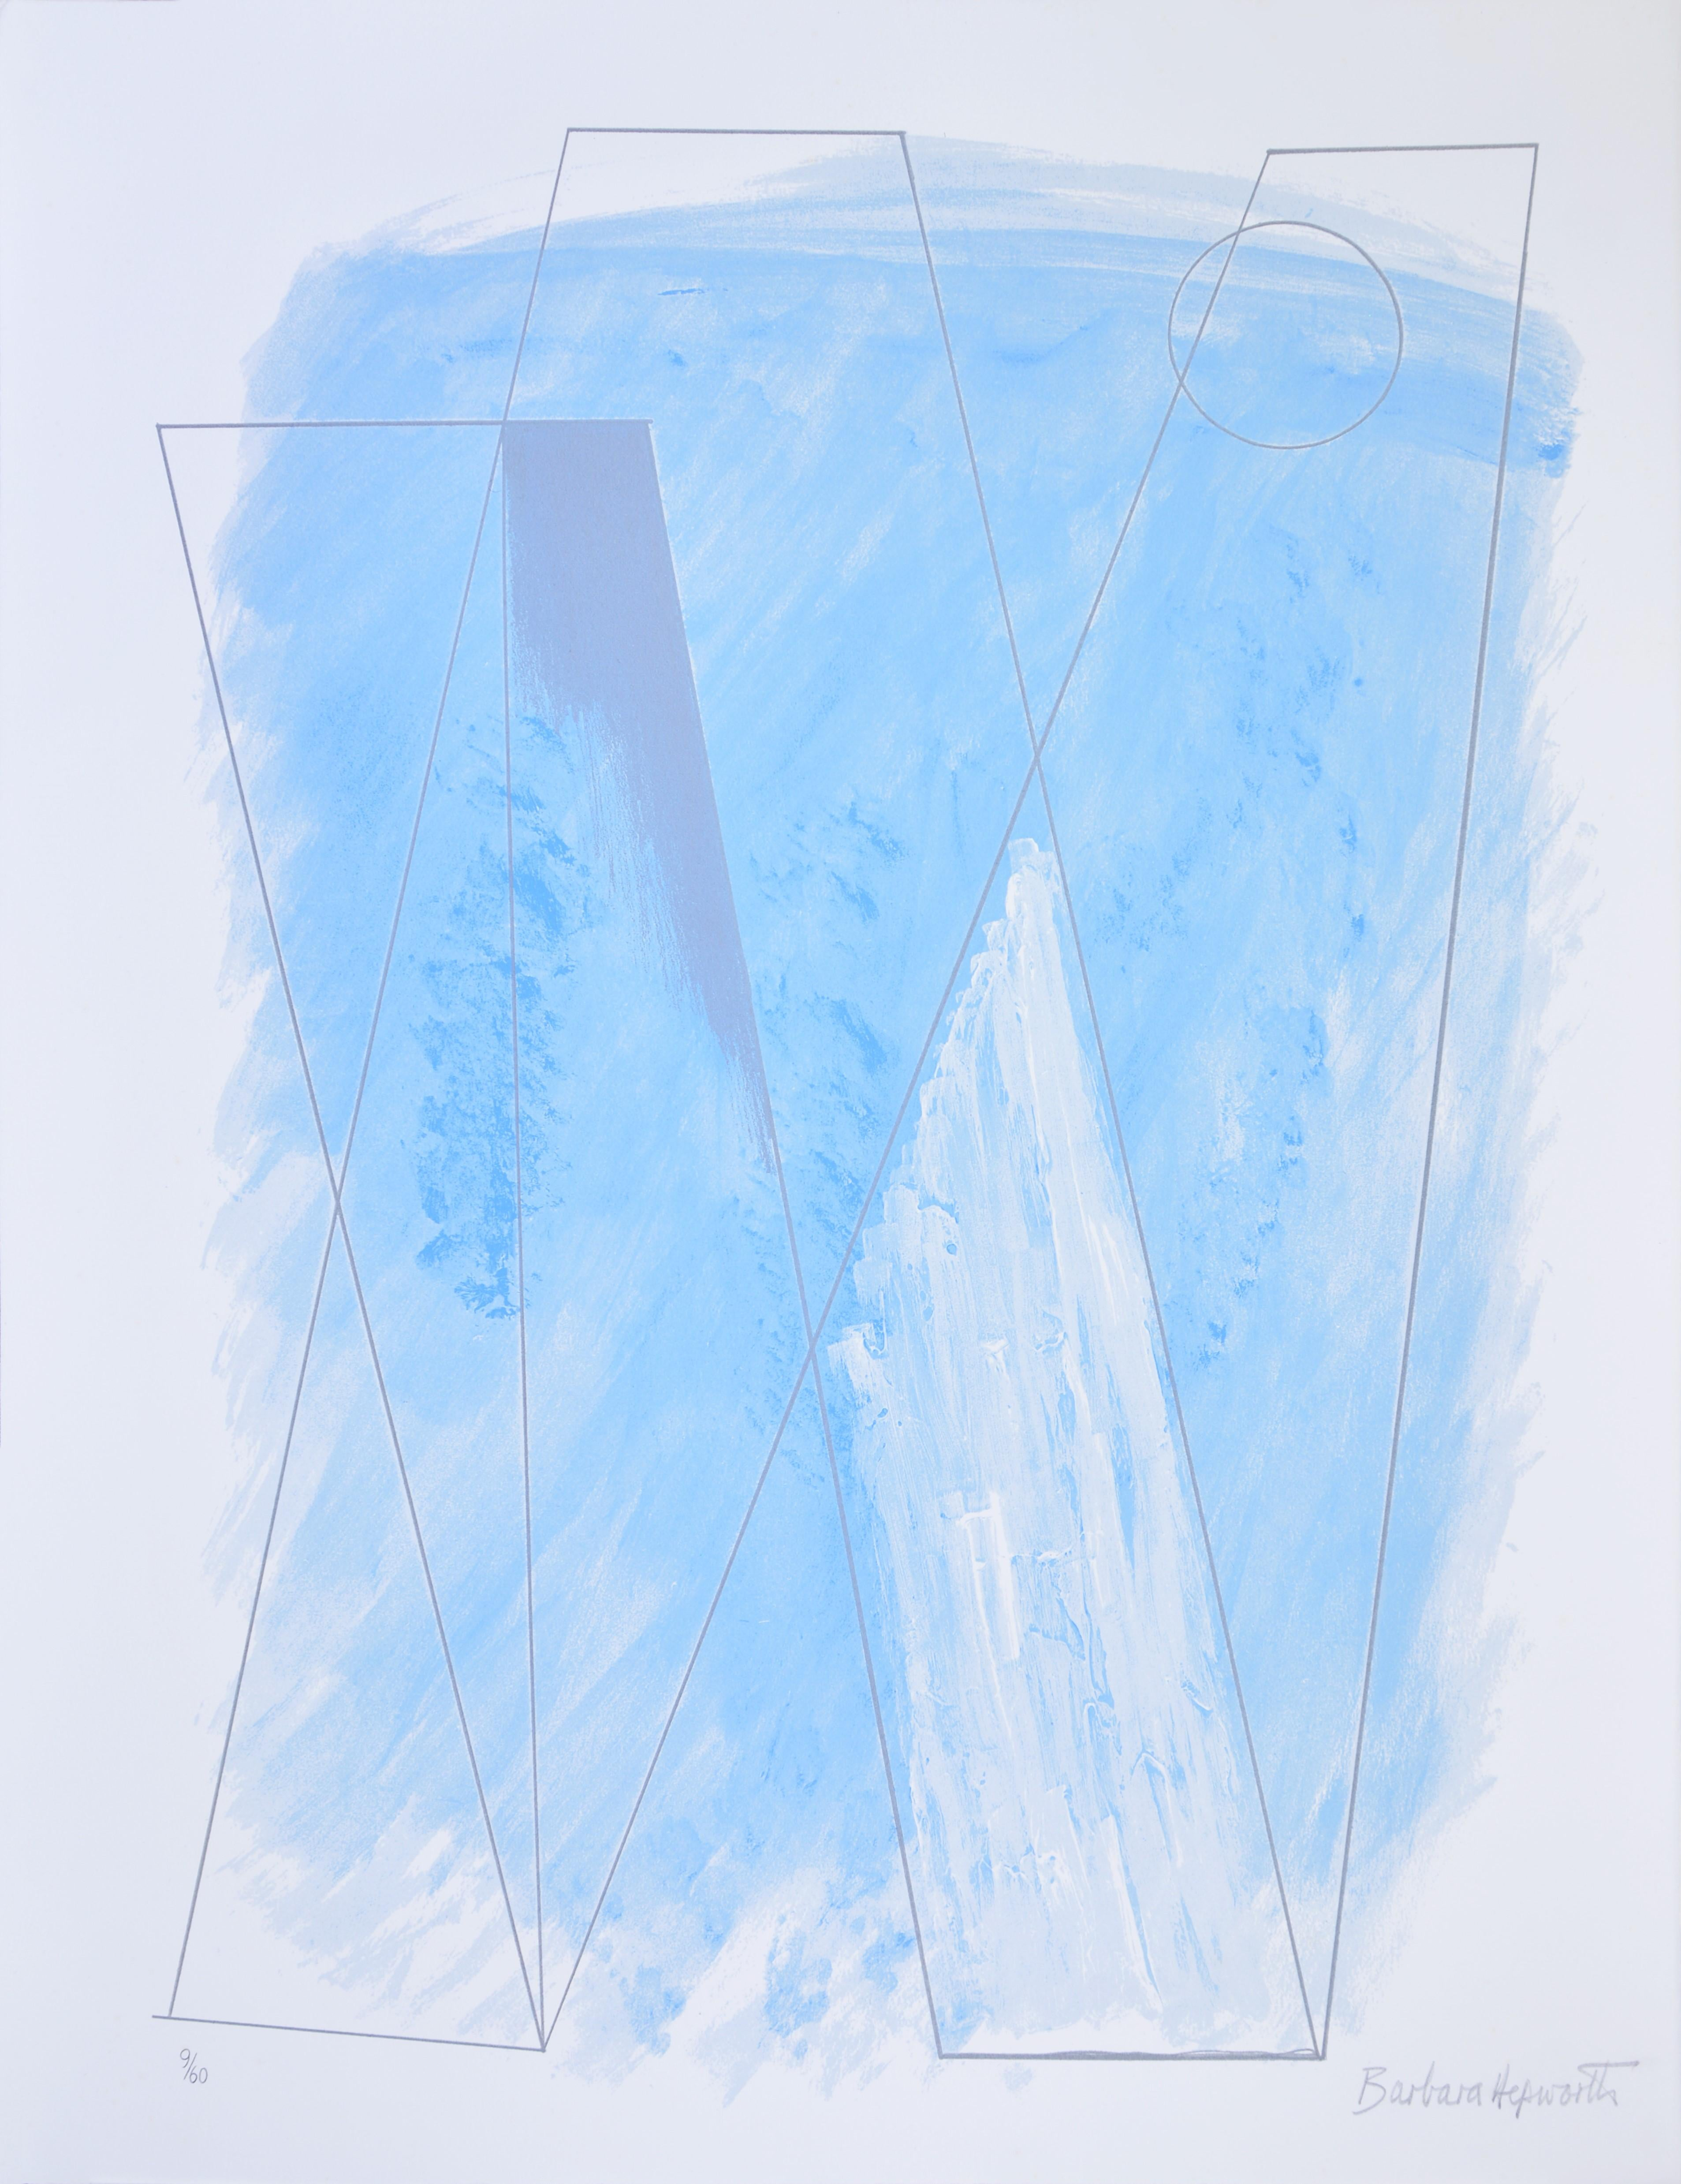 Barbara Hepworth, Three Forms, 1969-70